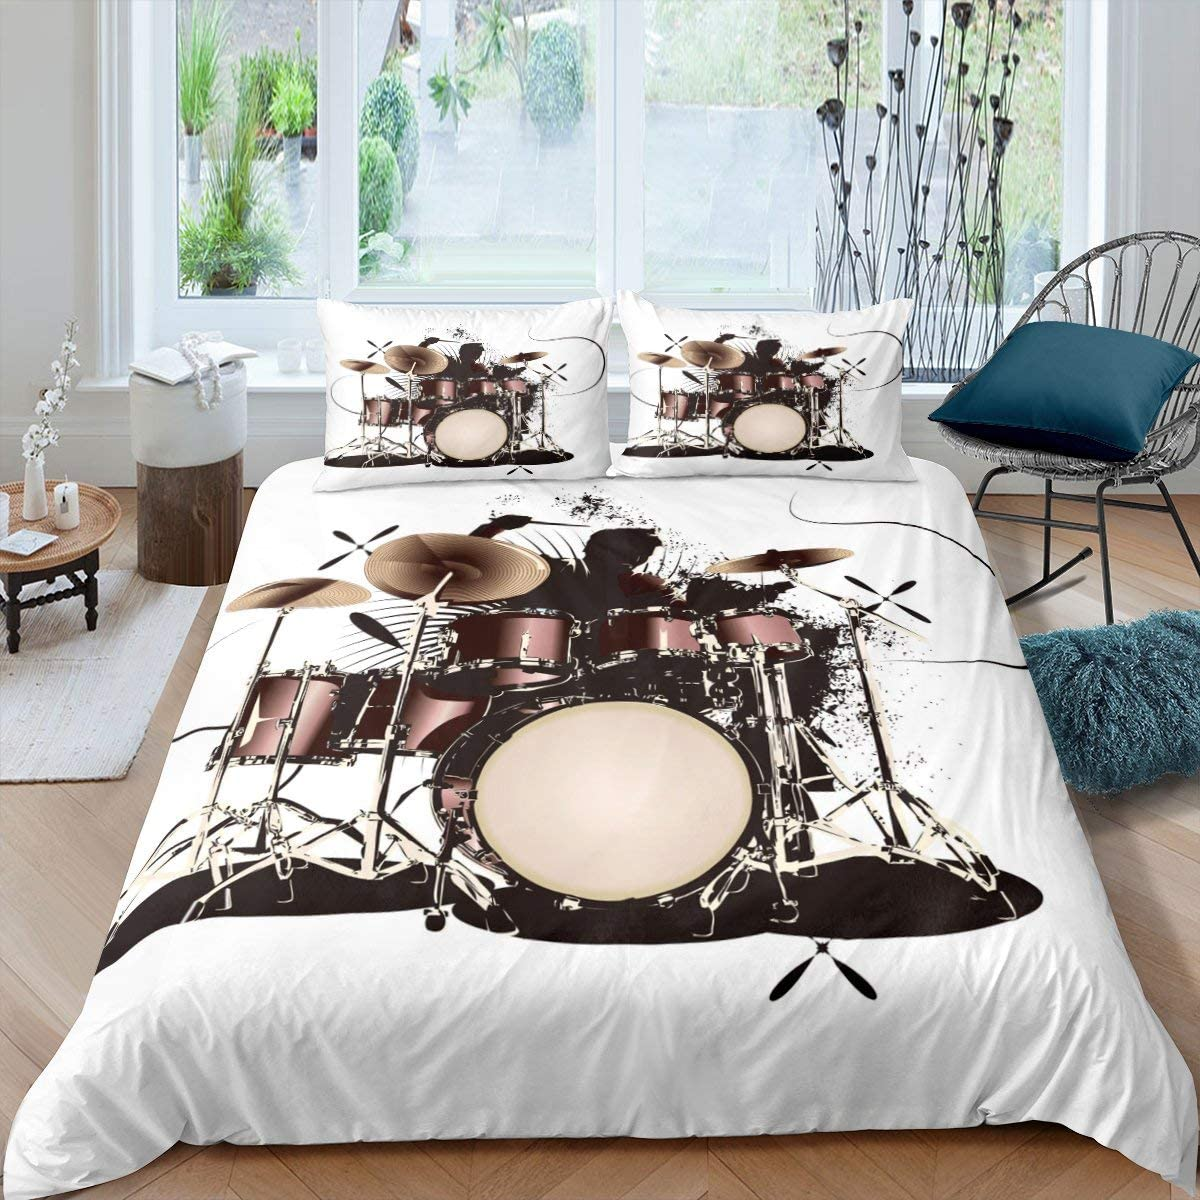 Boys Bedding Set Rock Music 超定番 休日 Cover Instr Musical Comforter Theme